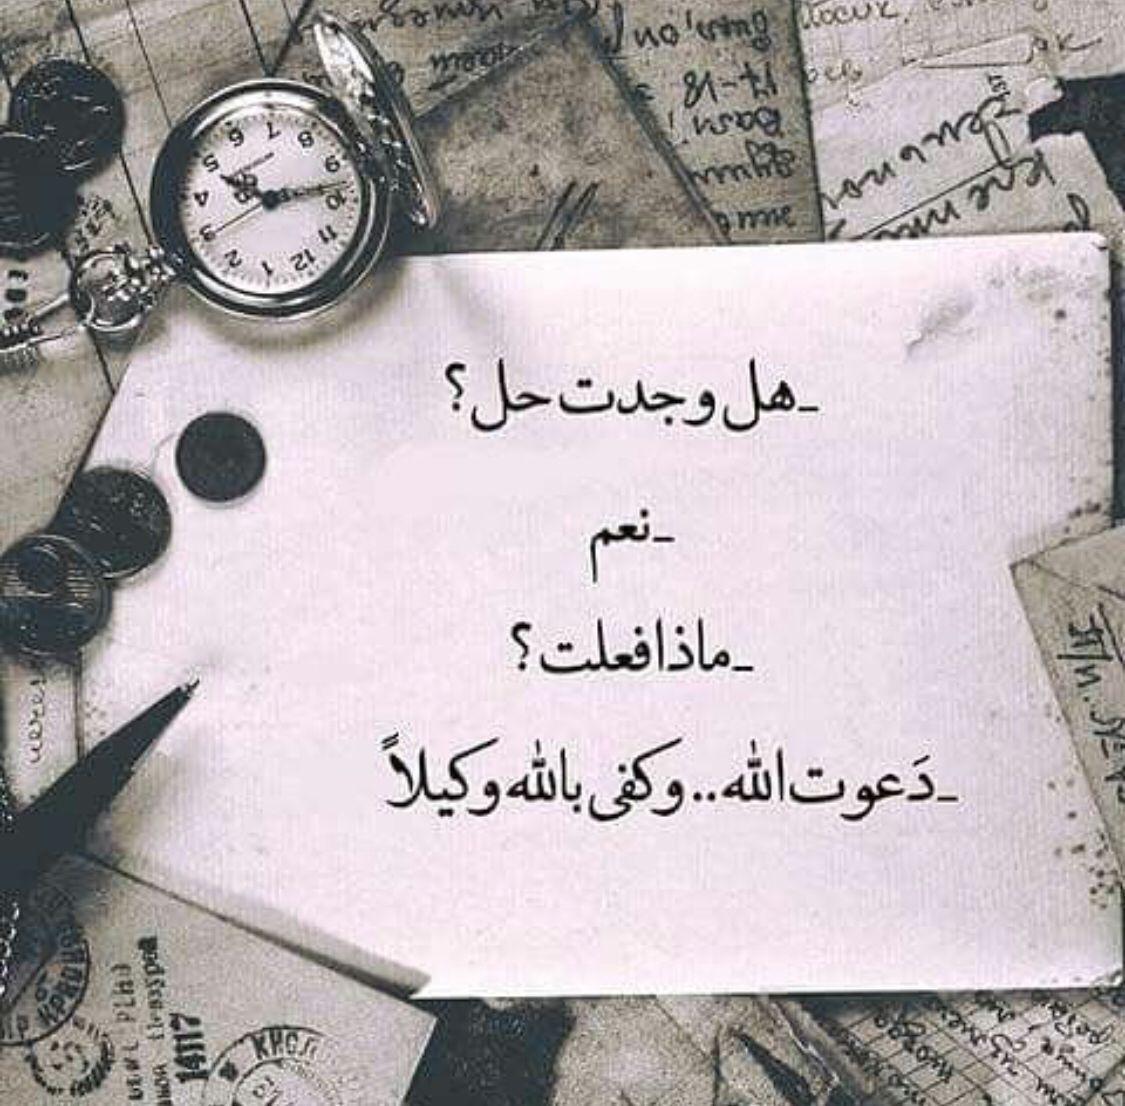 عبارات اسلامية مؤثرة Arabic Quotes Words Quotes Love Husband Quotes